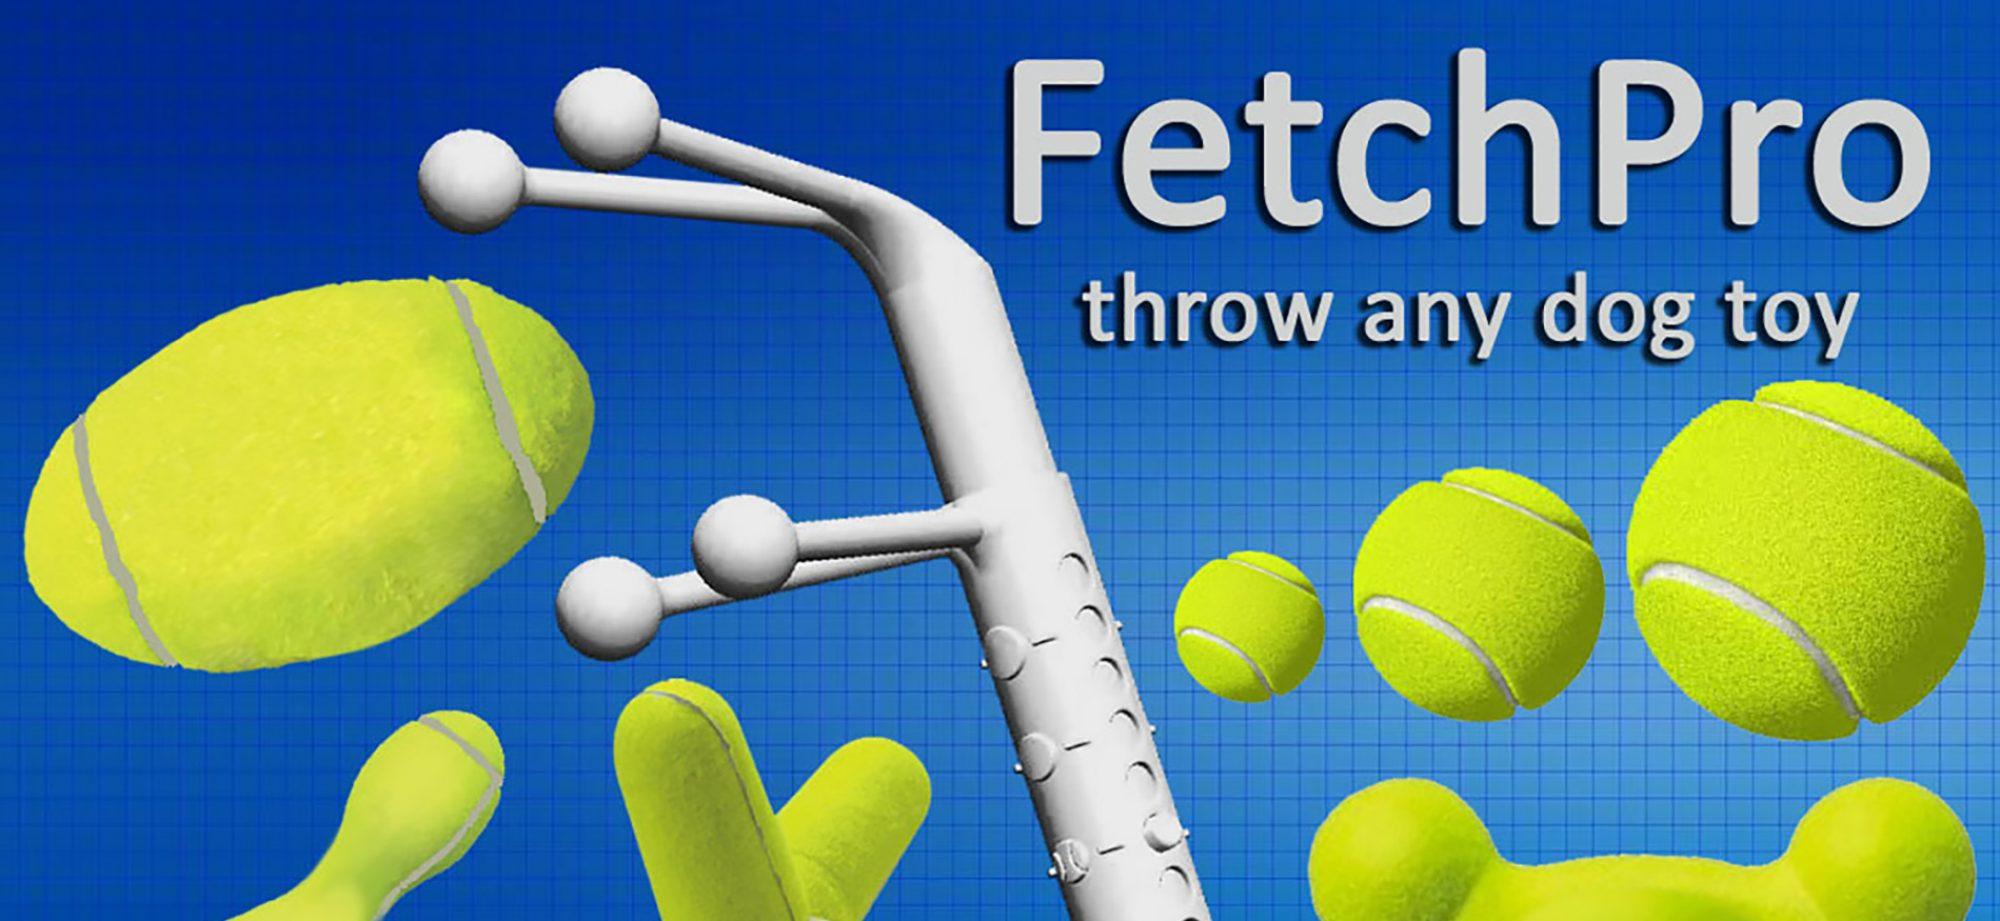 FetchPro